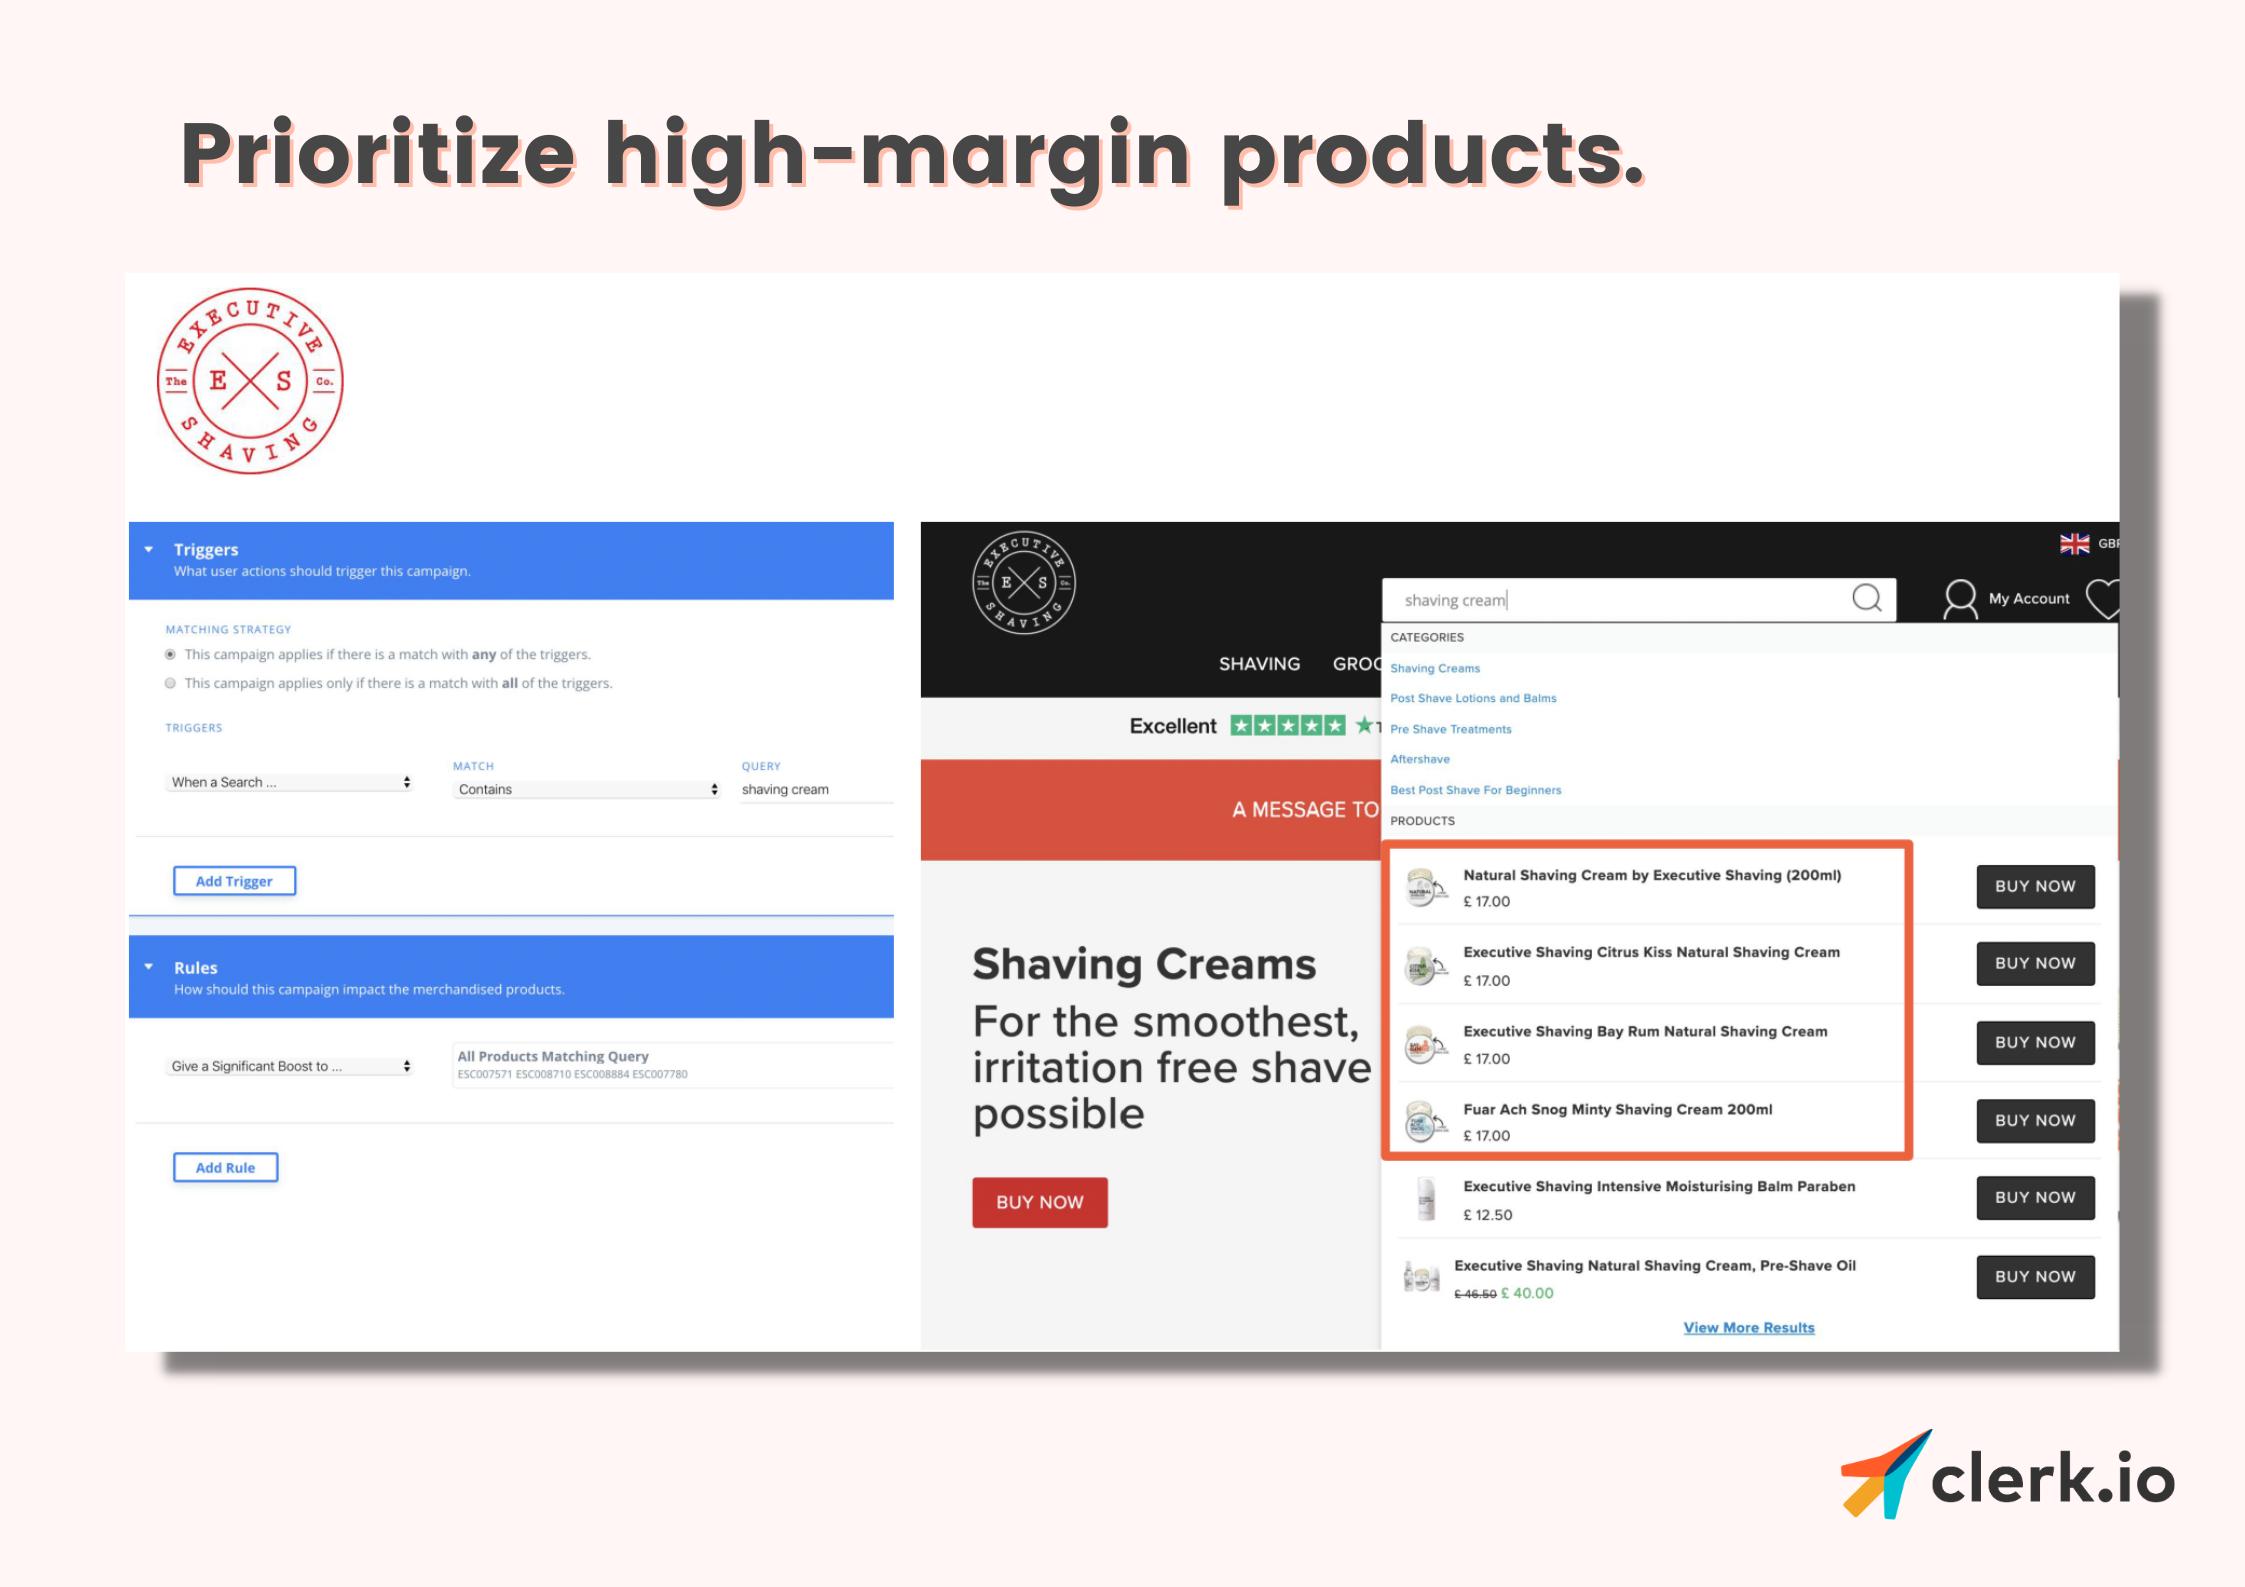 merchandising: high-margin products